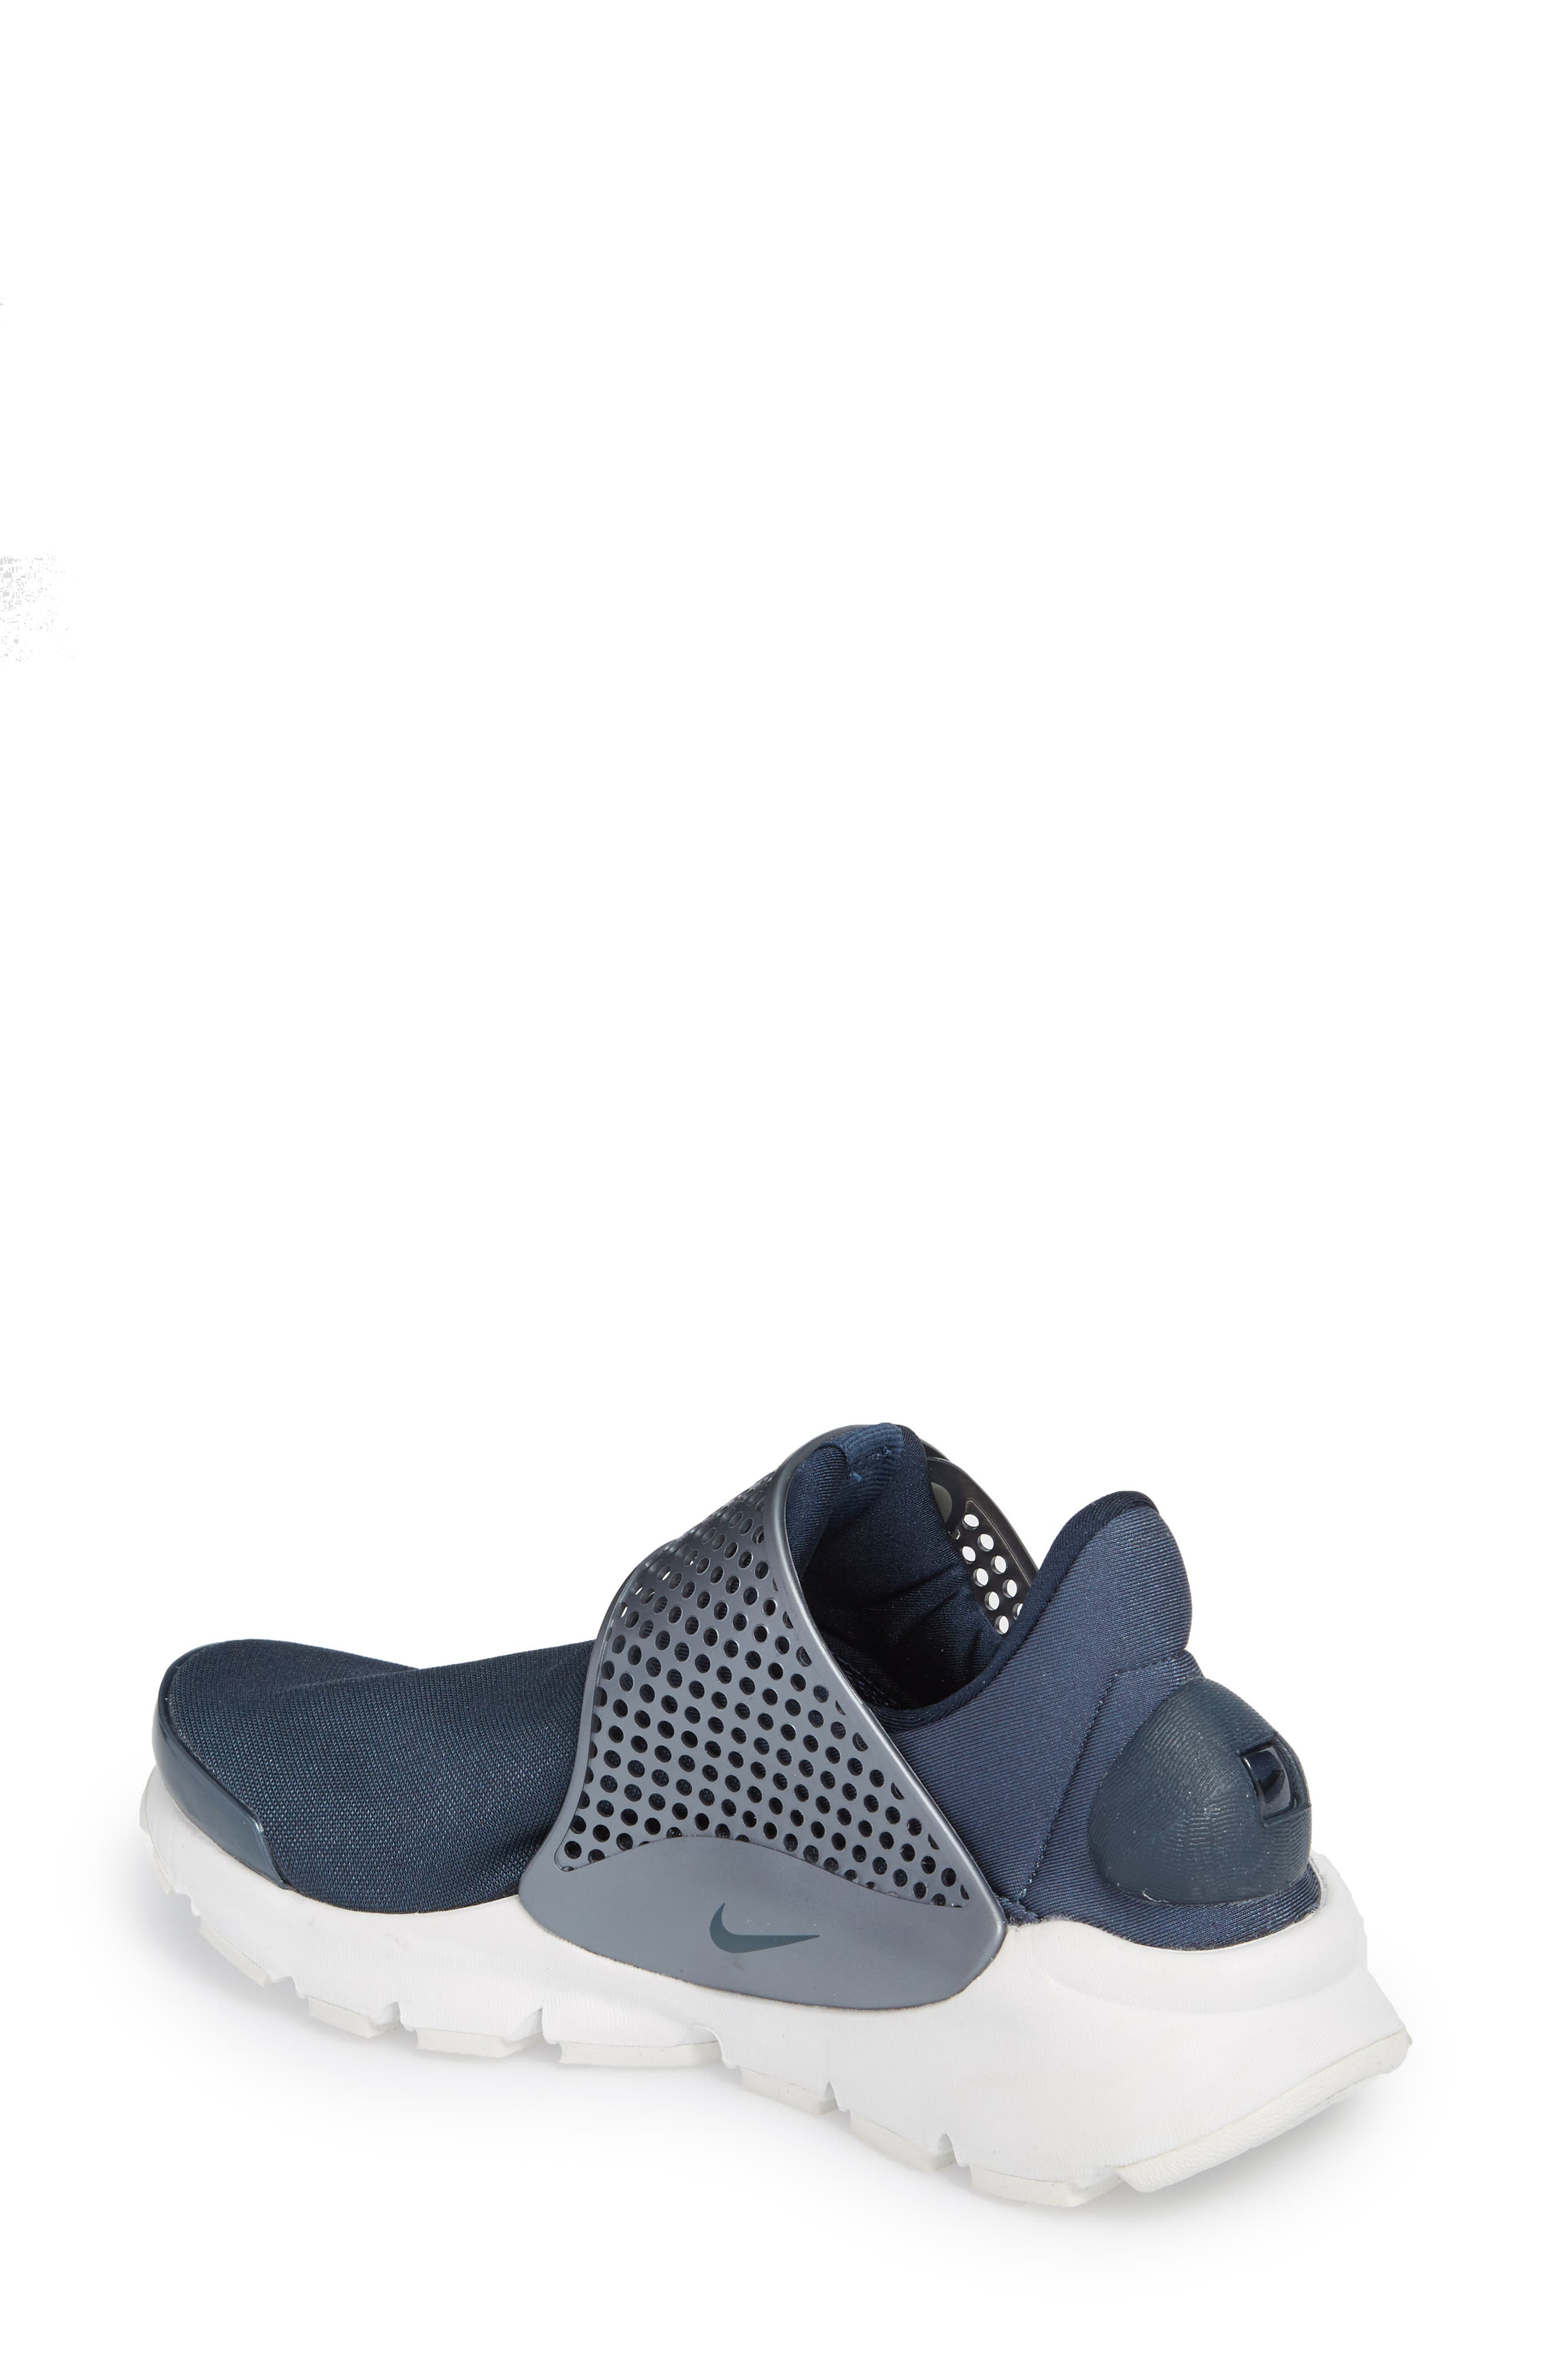 Sock Dart Sneaker,                             Alternate thumbnail 2, color,                             Metallic/ Armory Navy